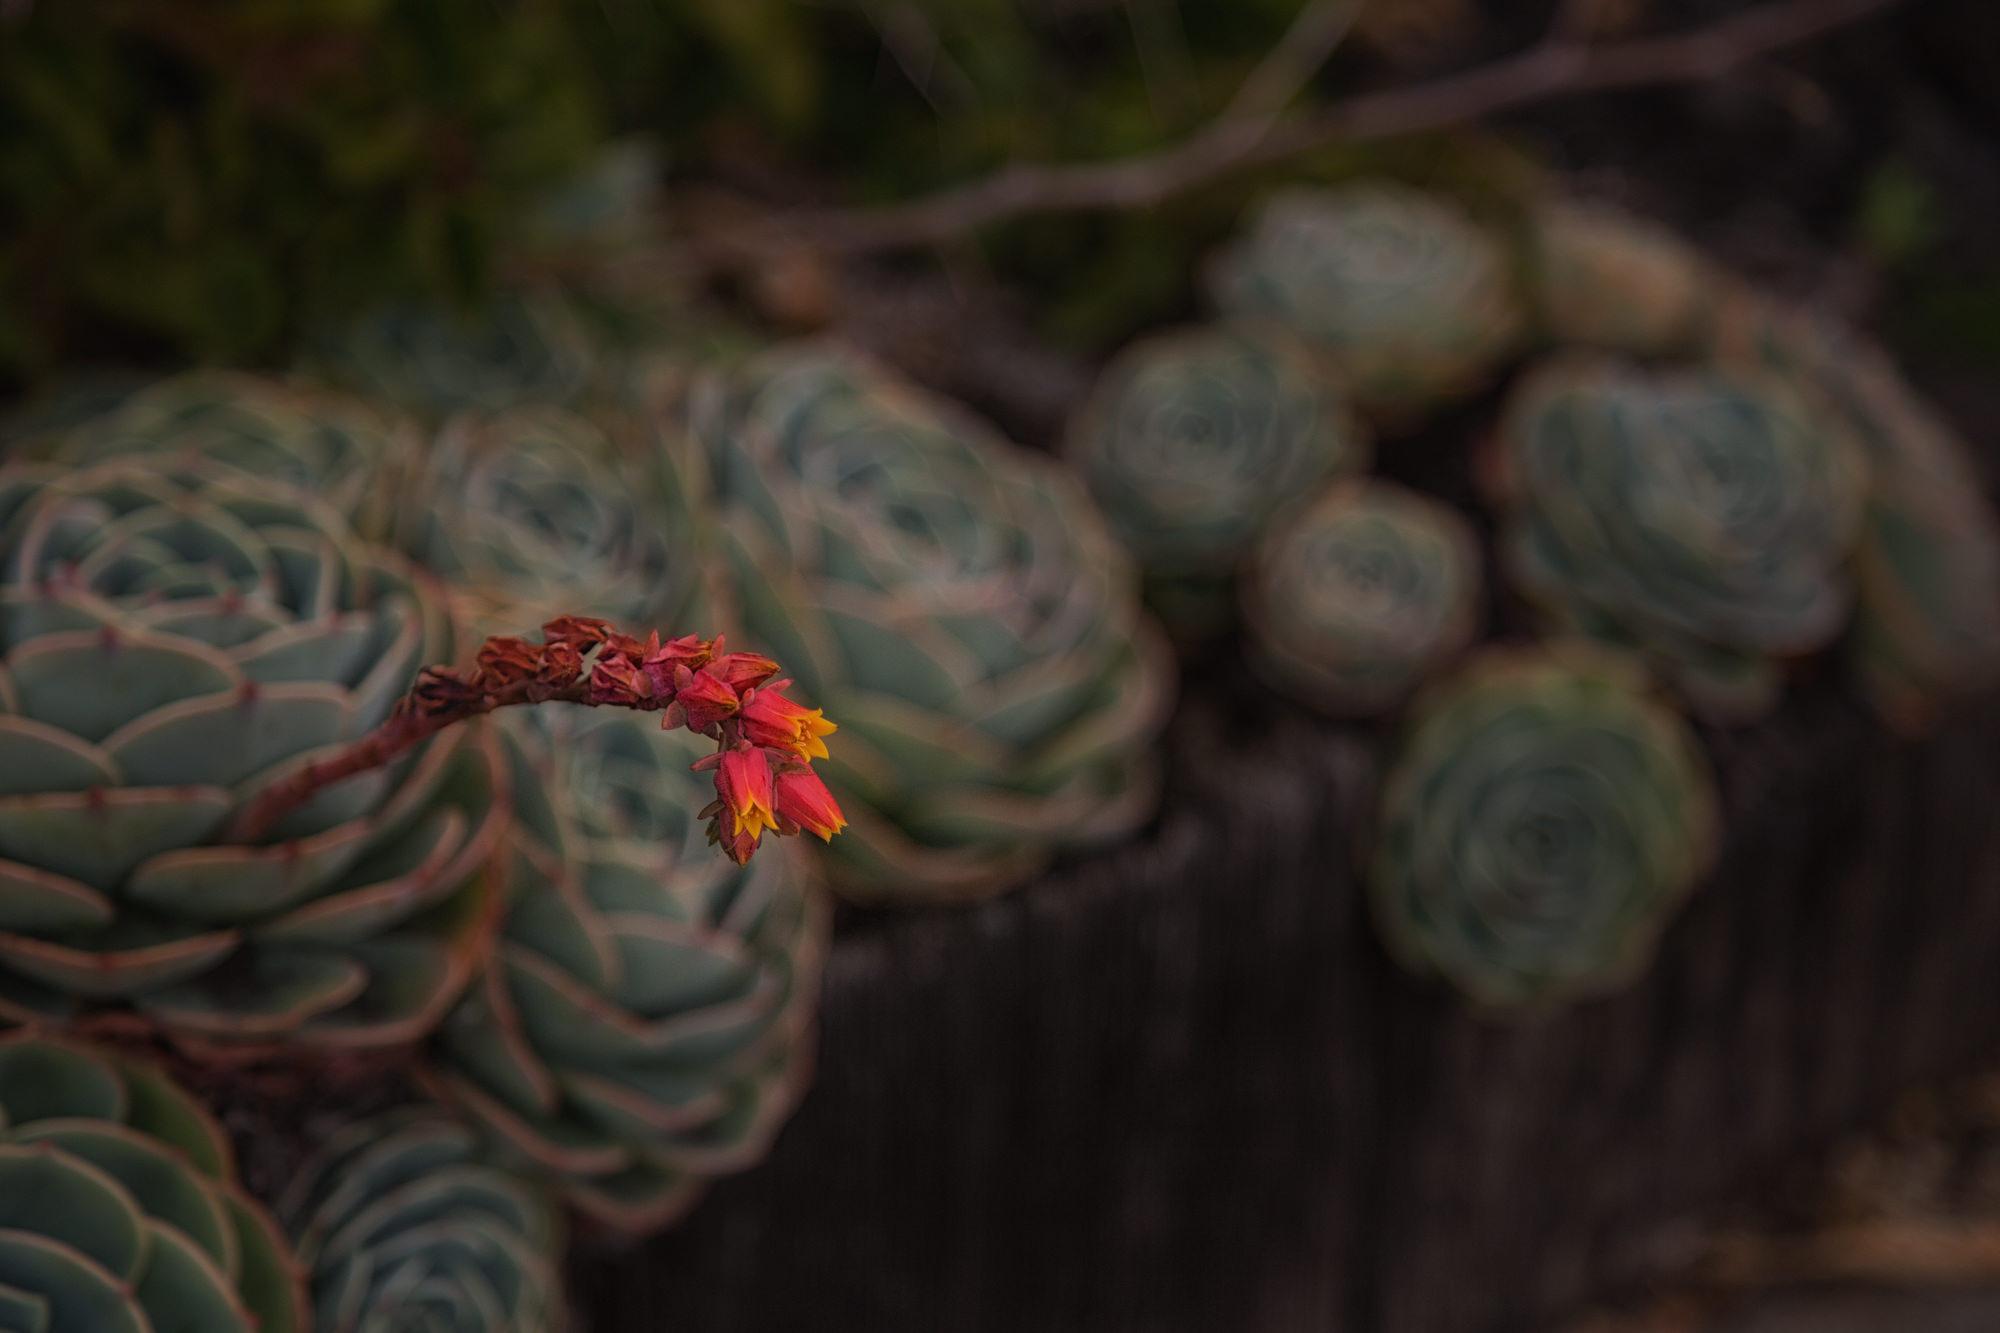 Berkeley Garden flower at dusk